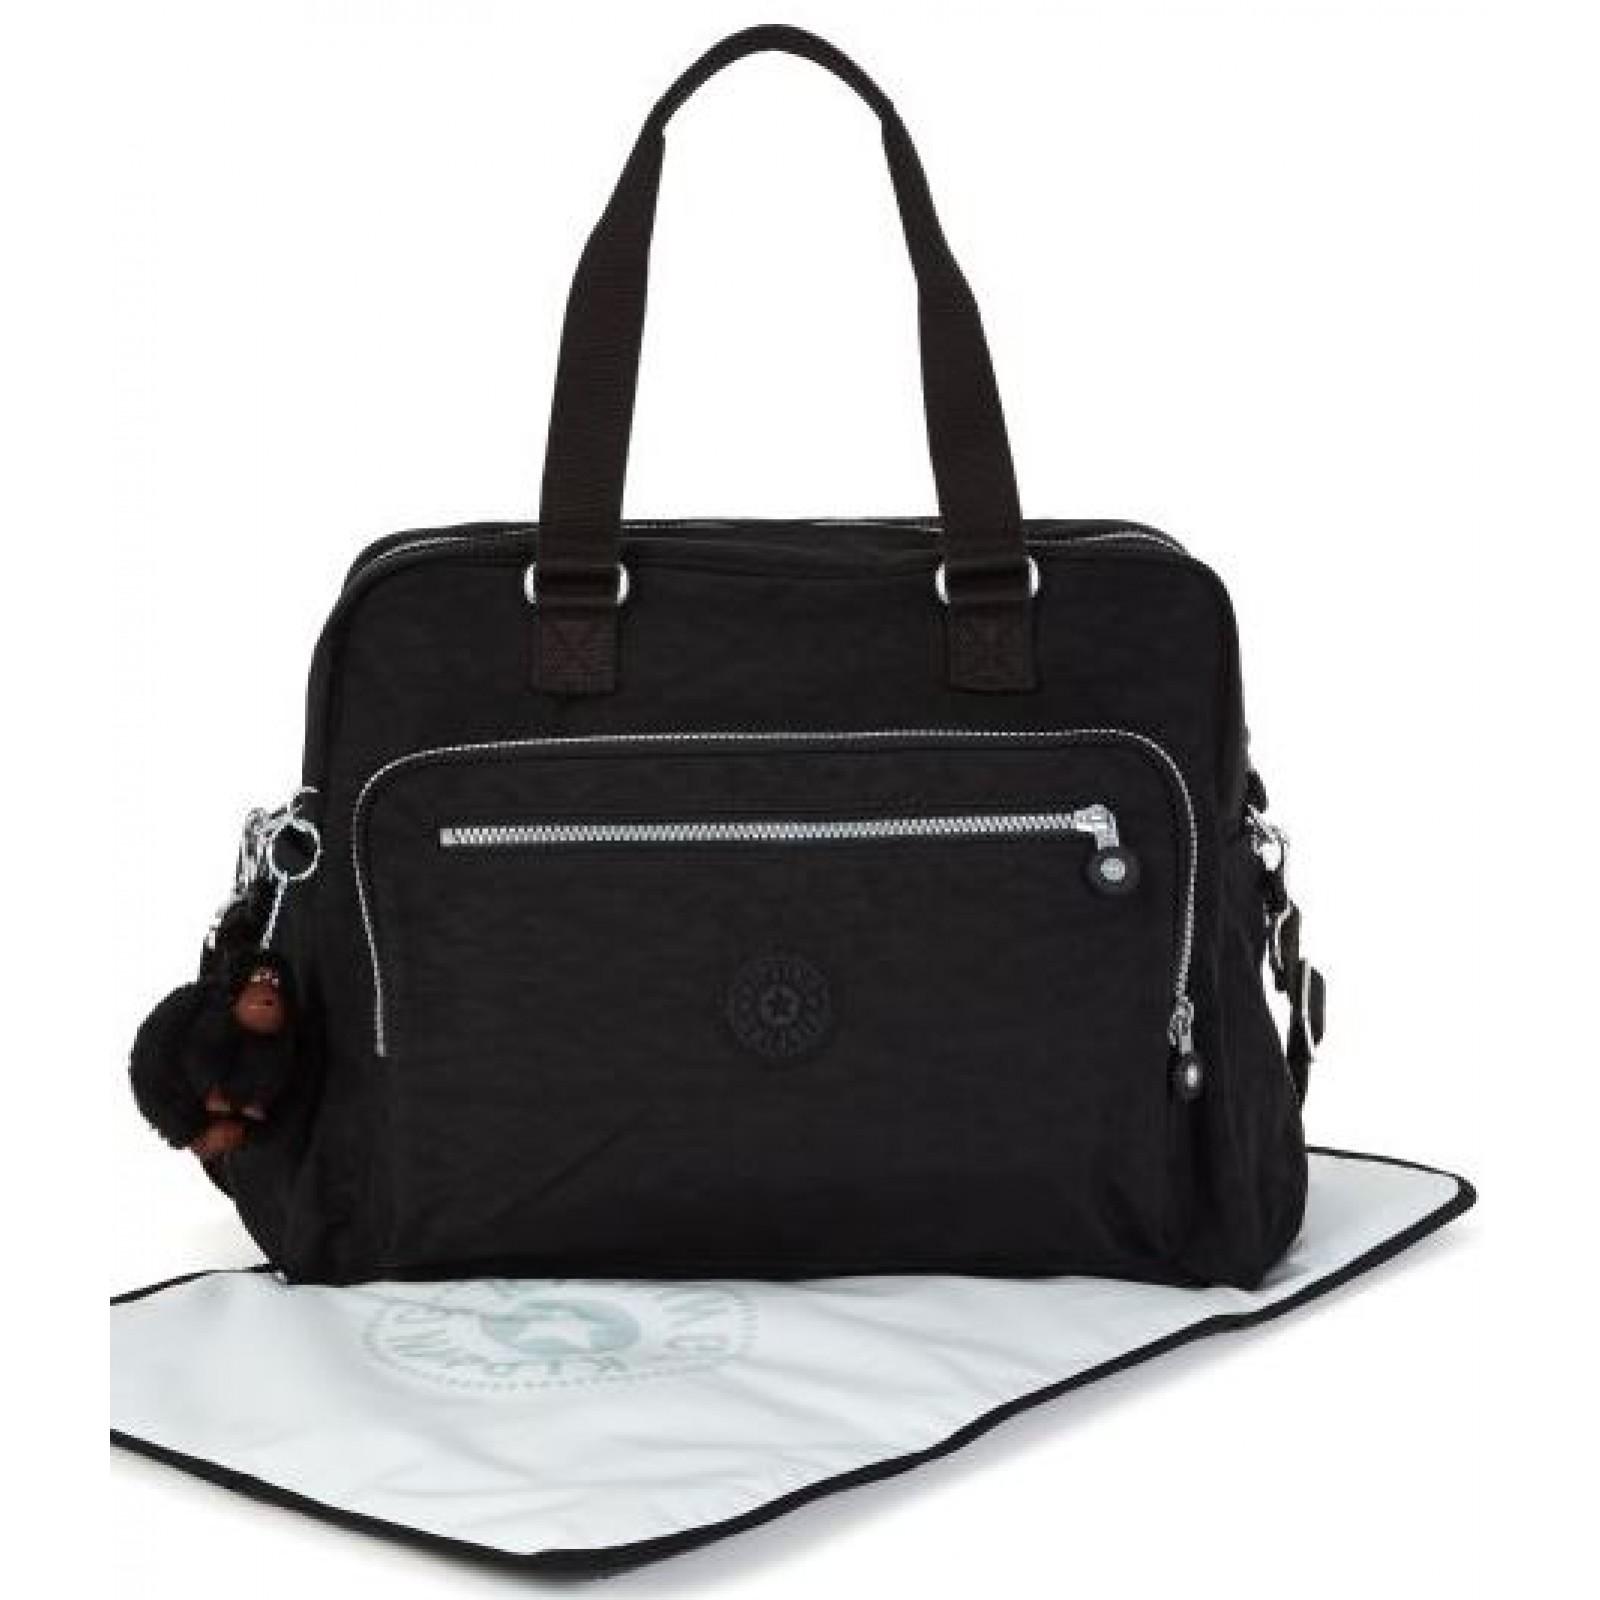 Kipling Alanna Baby Bag Tm5266 001 Luggage World Mn